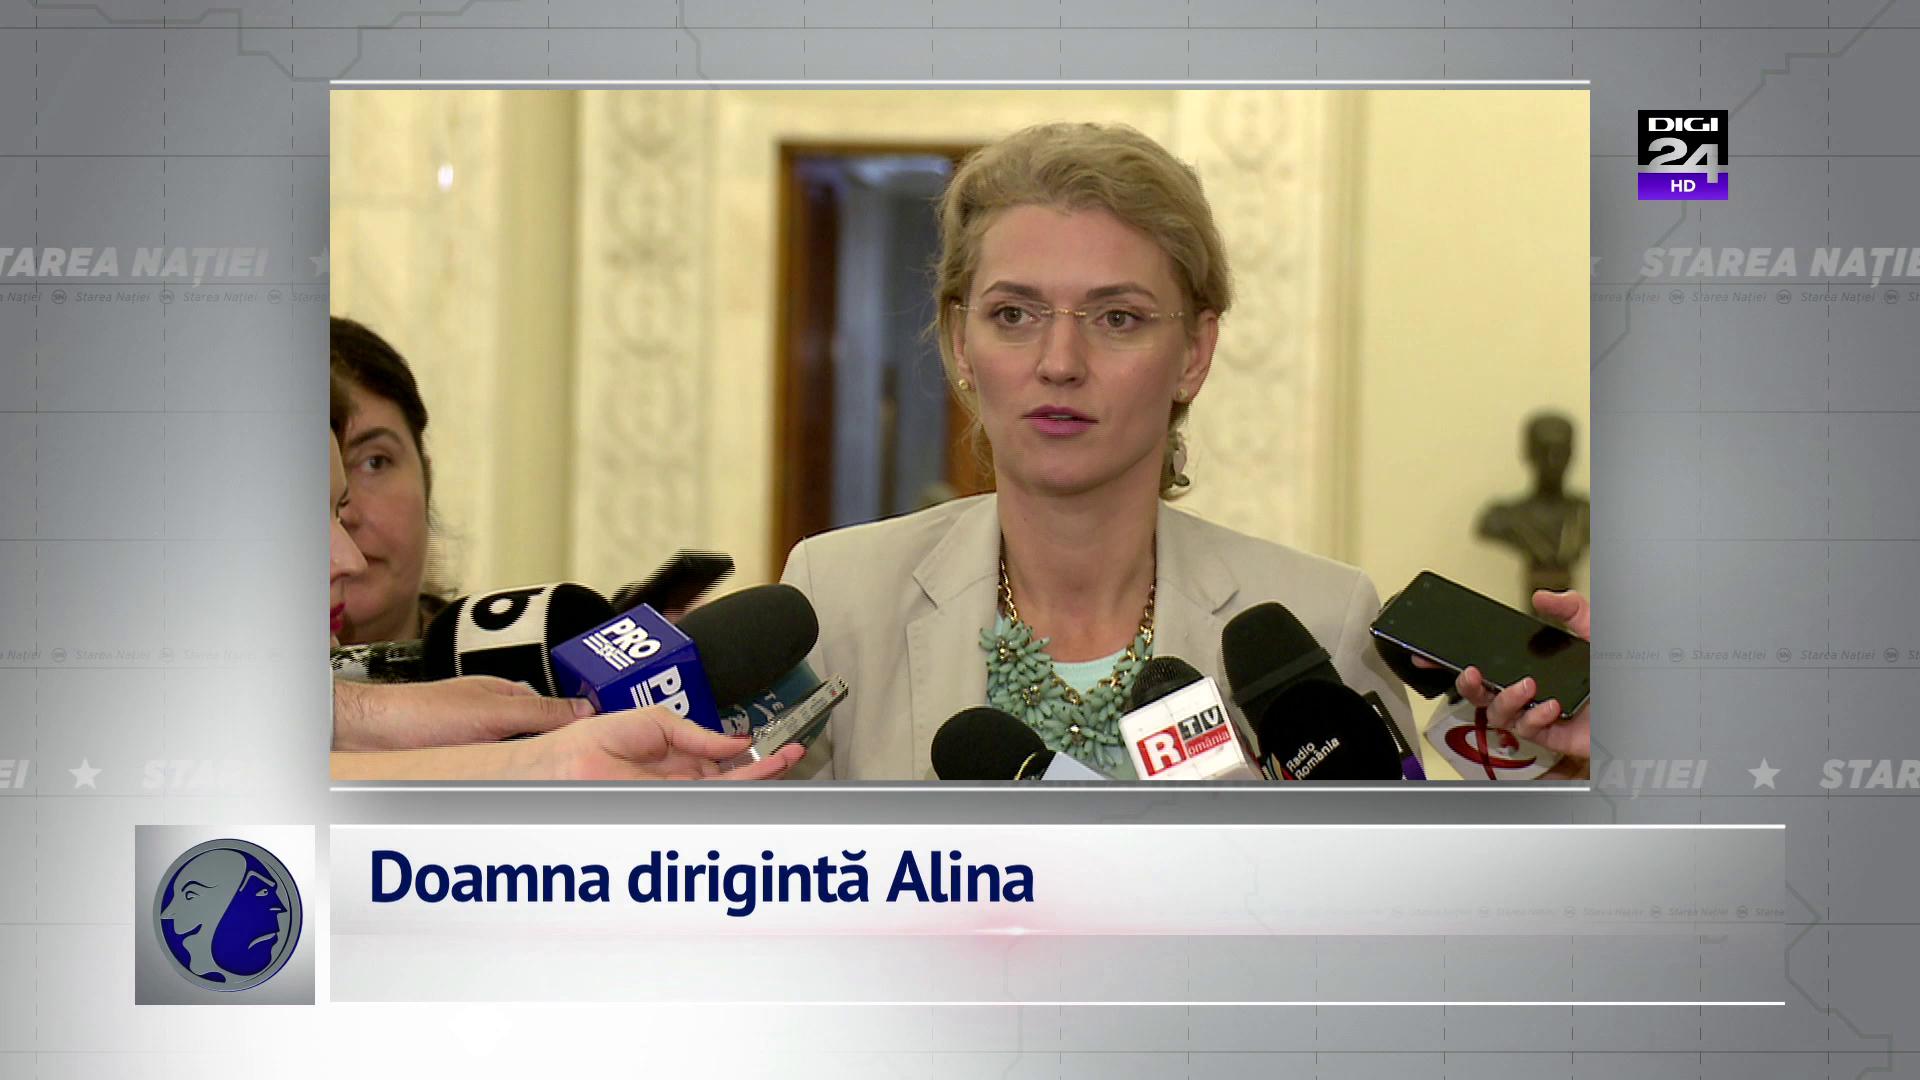 Doamna dirigintă Alina